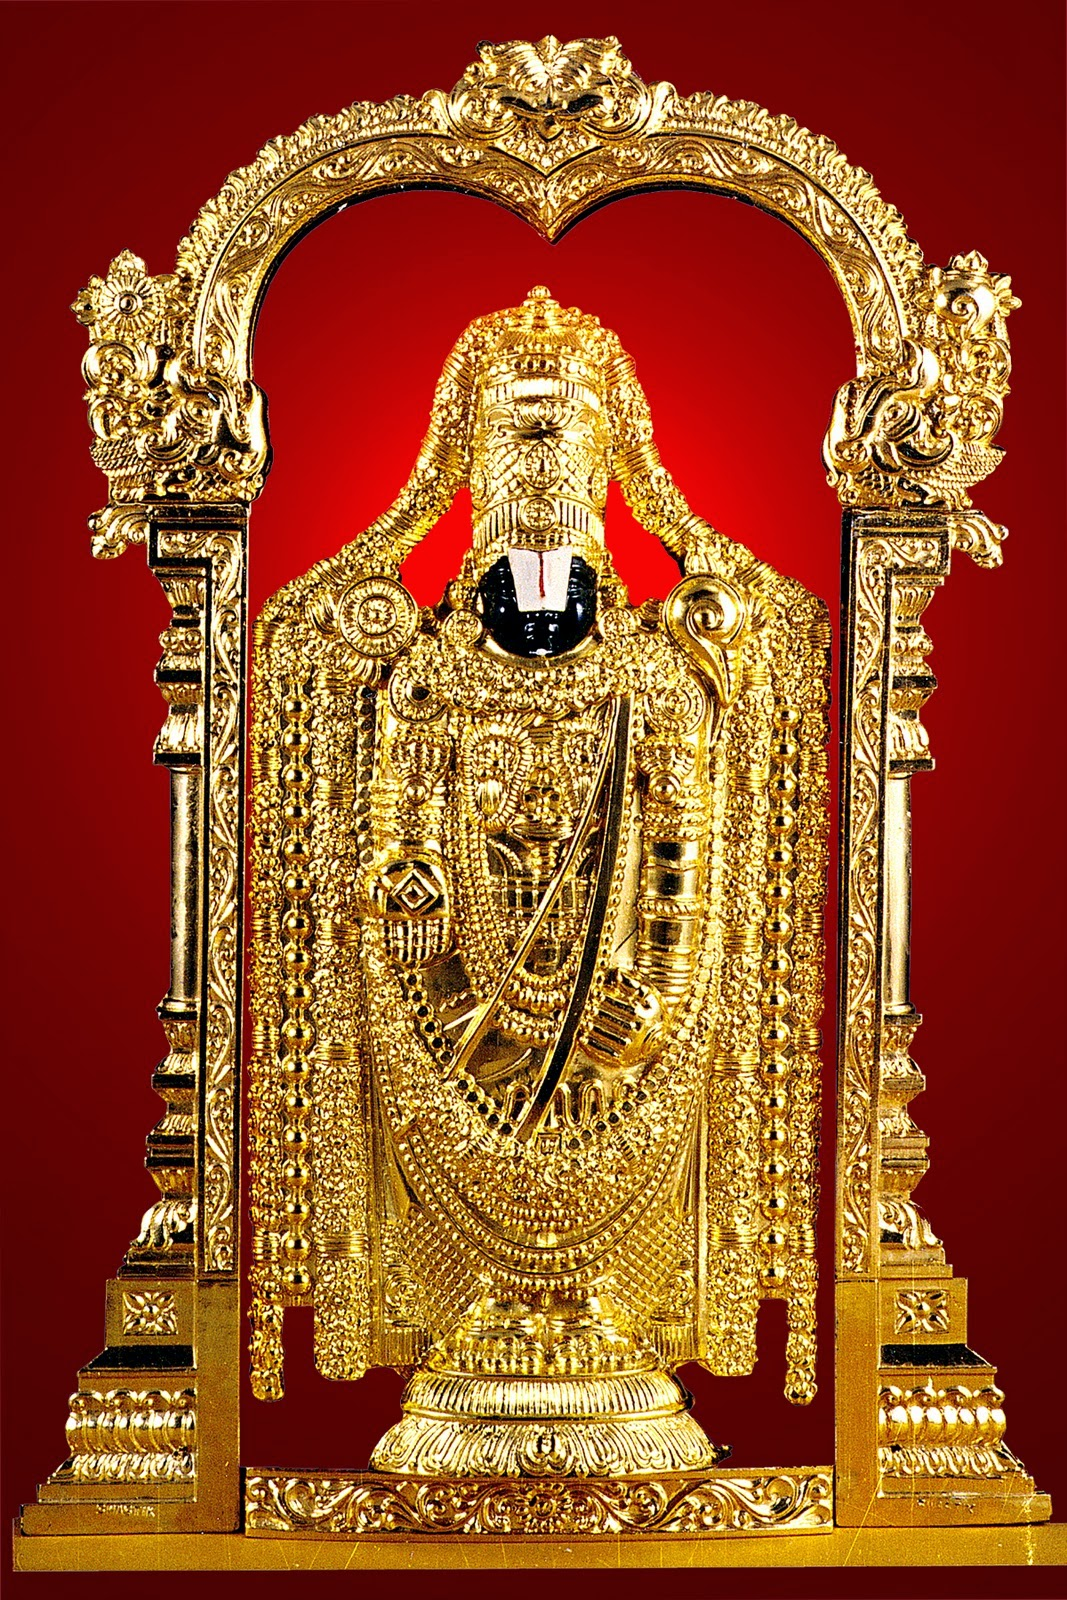 Anu 3d Name Wallpaper Hd Wallpapers Hdwallpapers Org In Lord Venkateswara